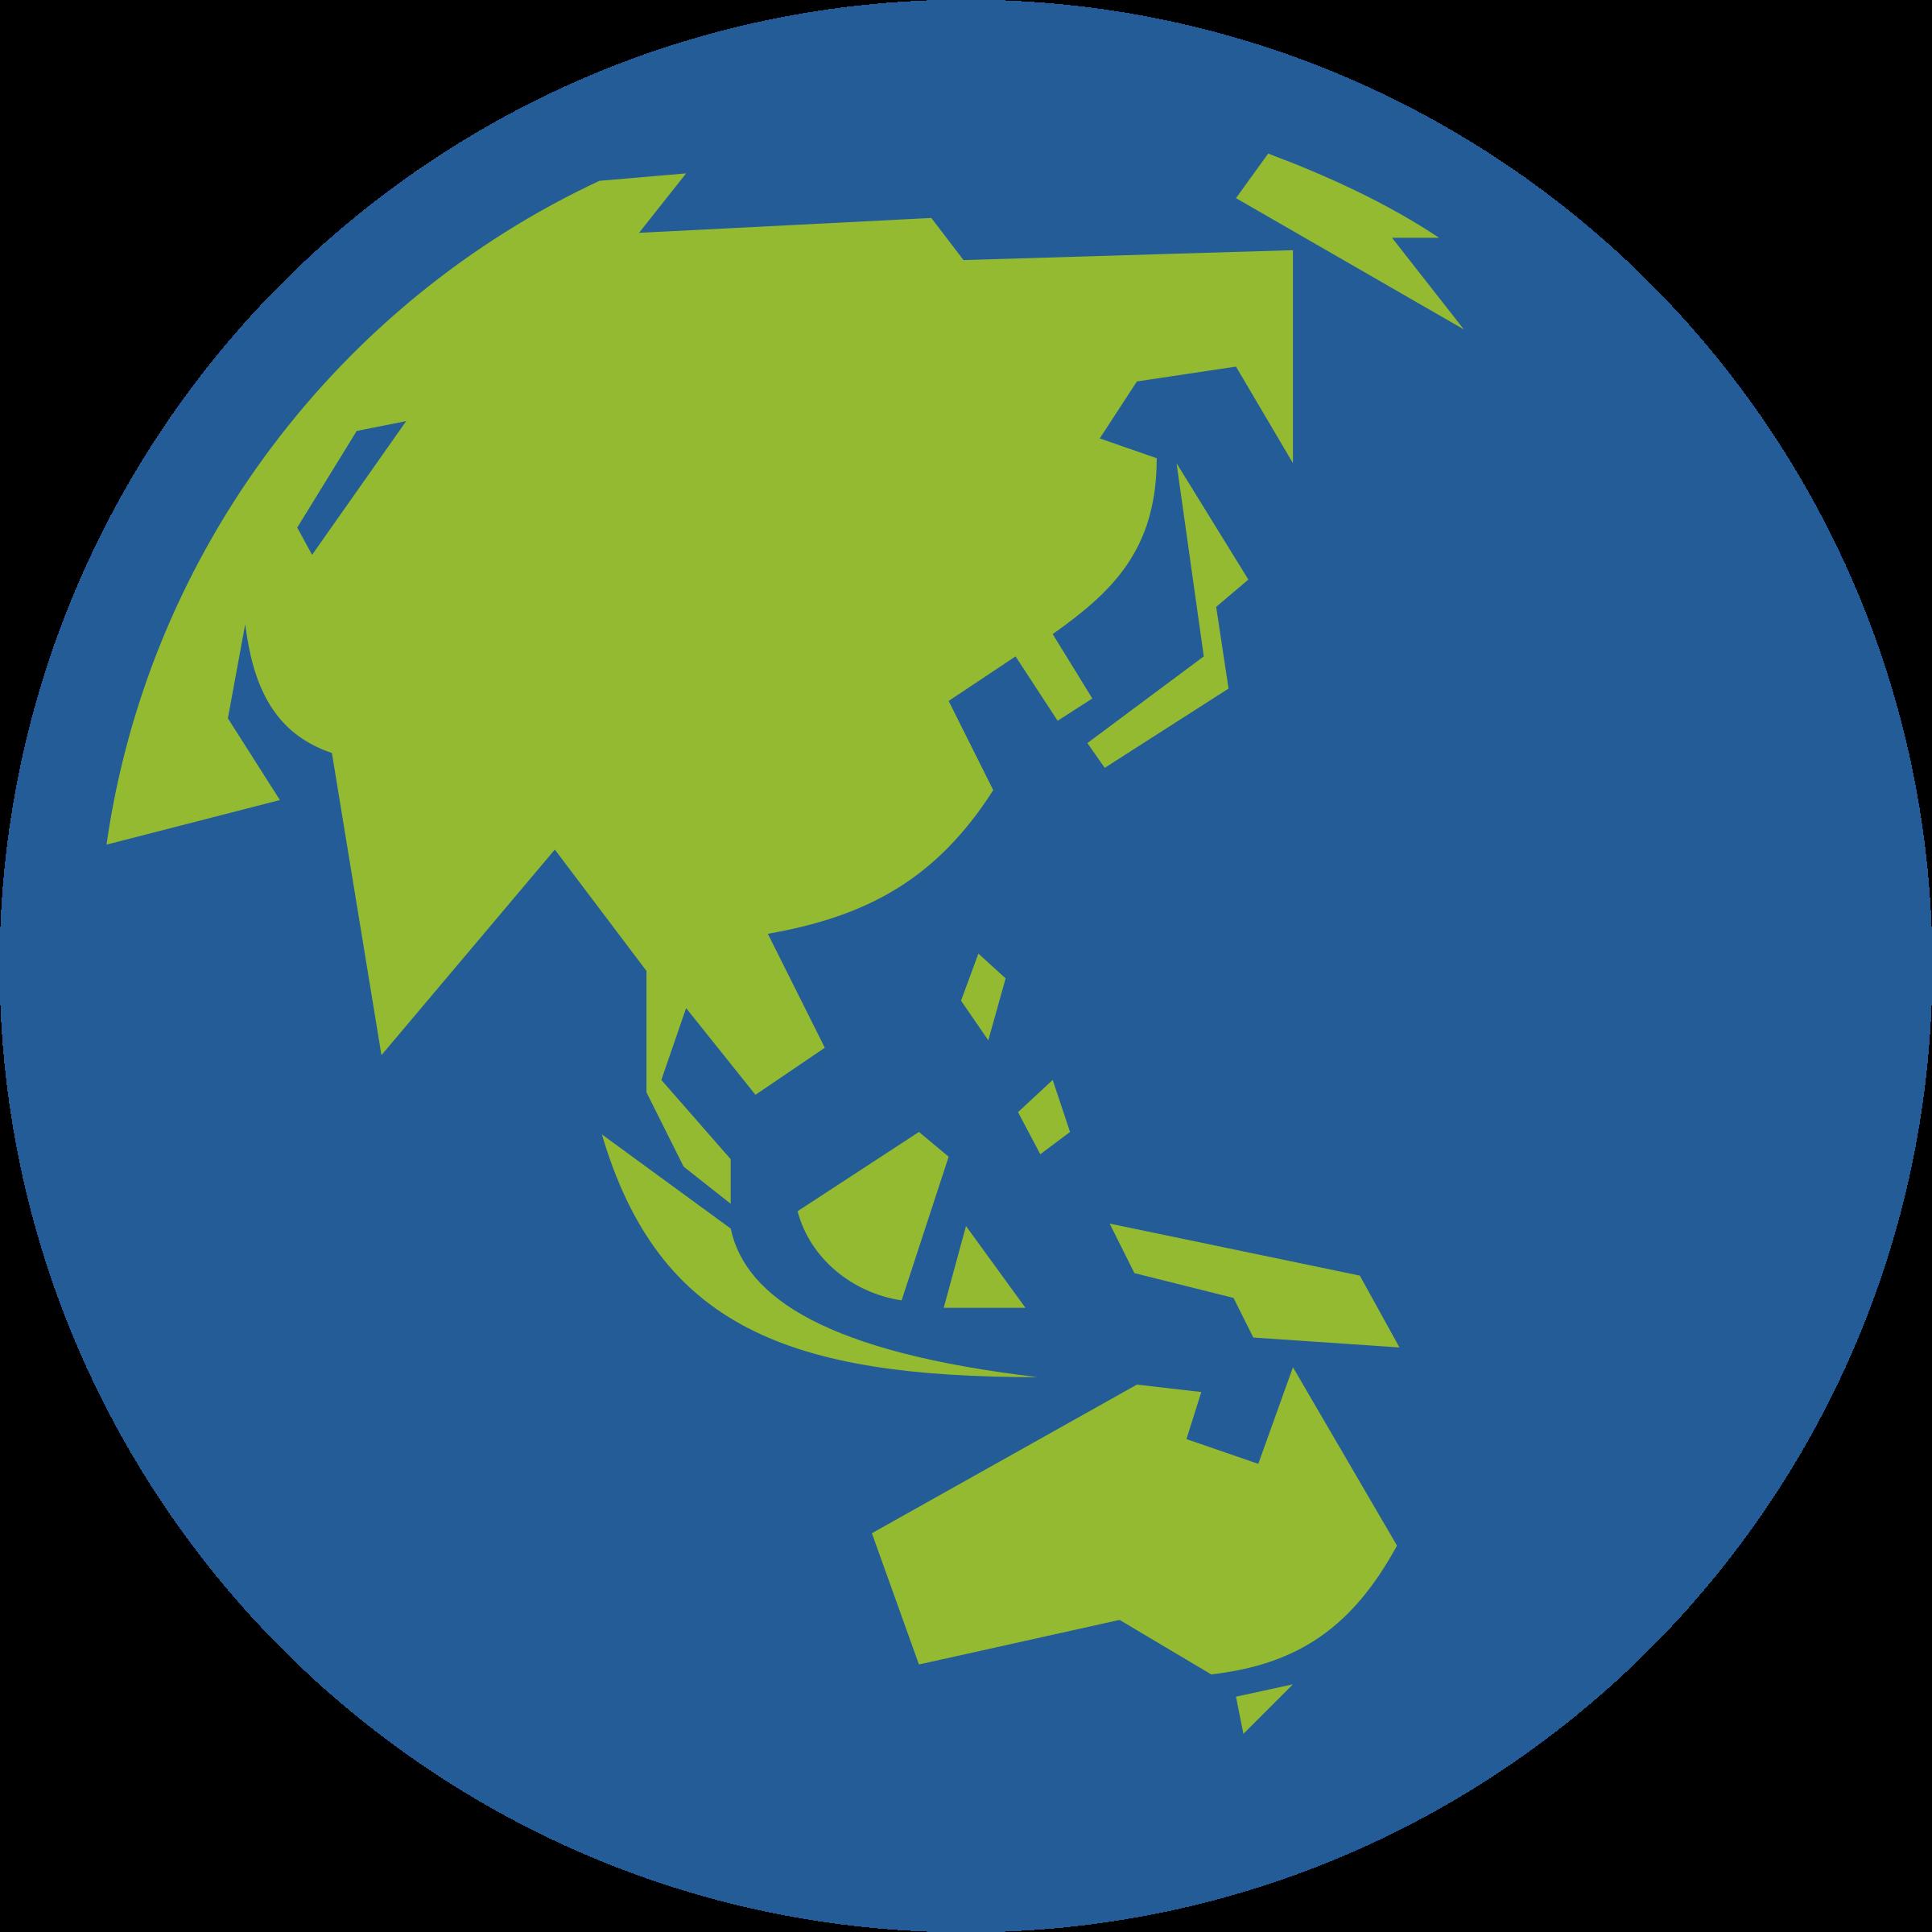 2400x2400 Asia Globe Clipart